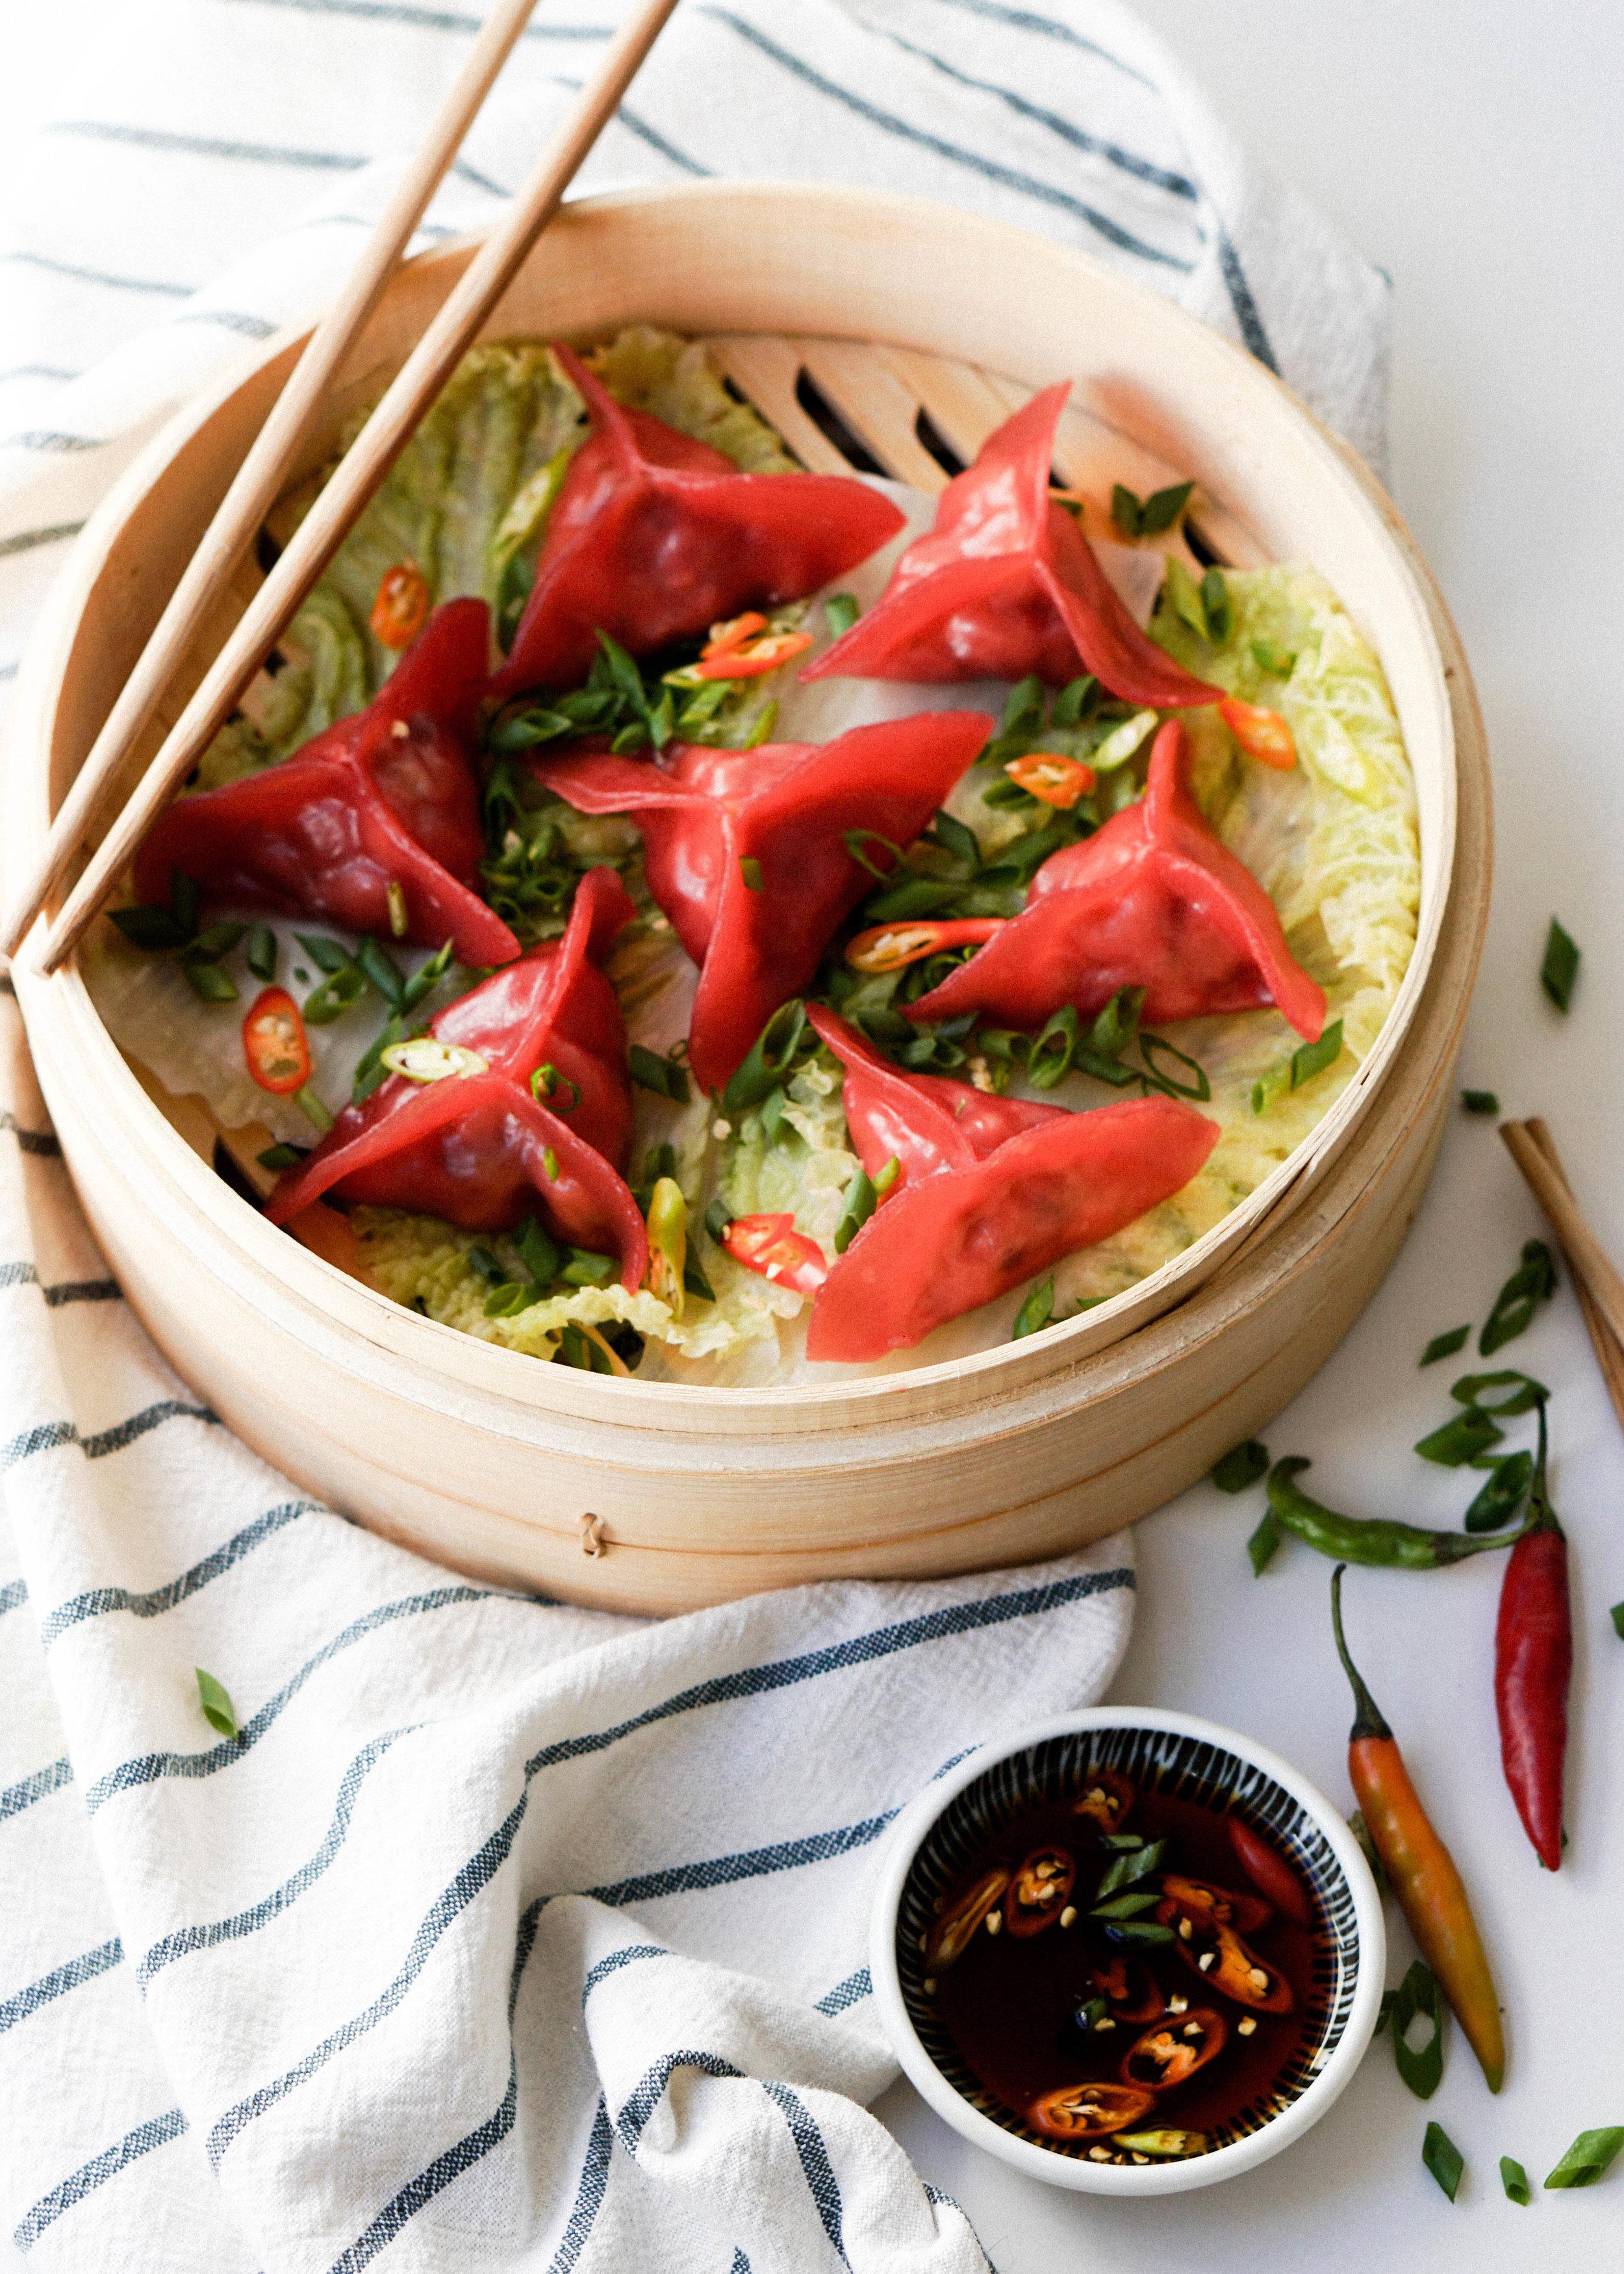 Spicy Fish Dumplings